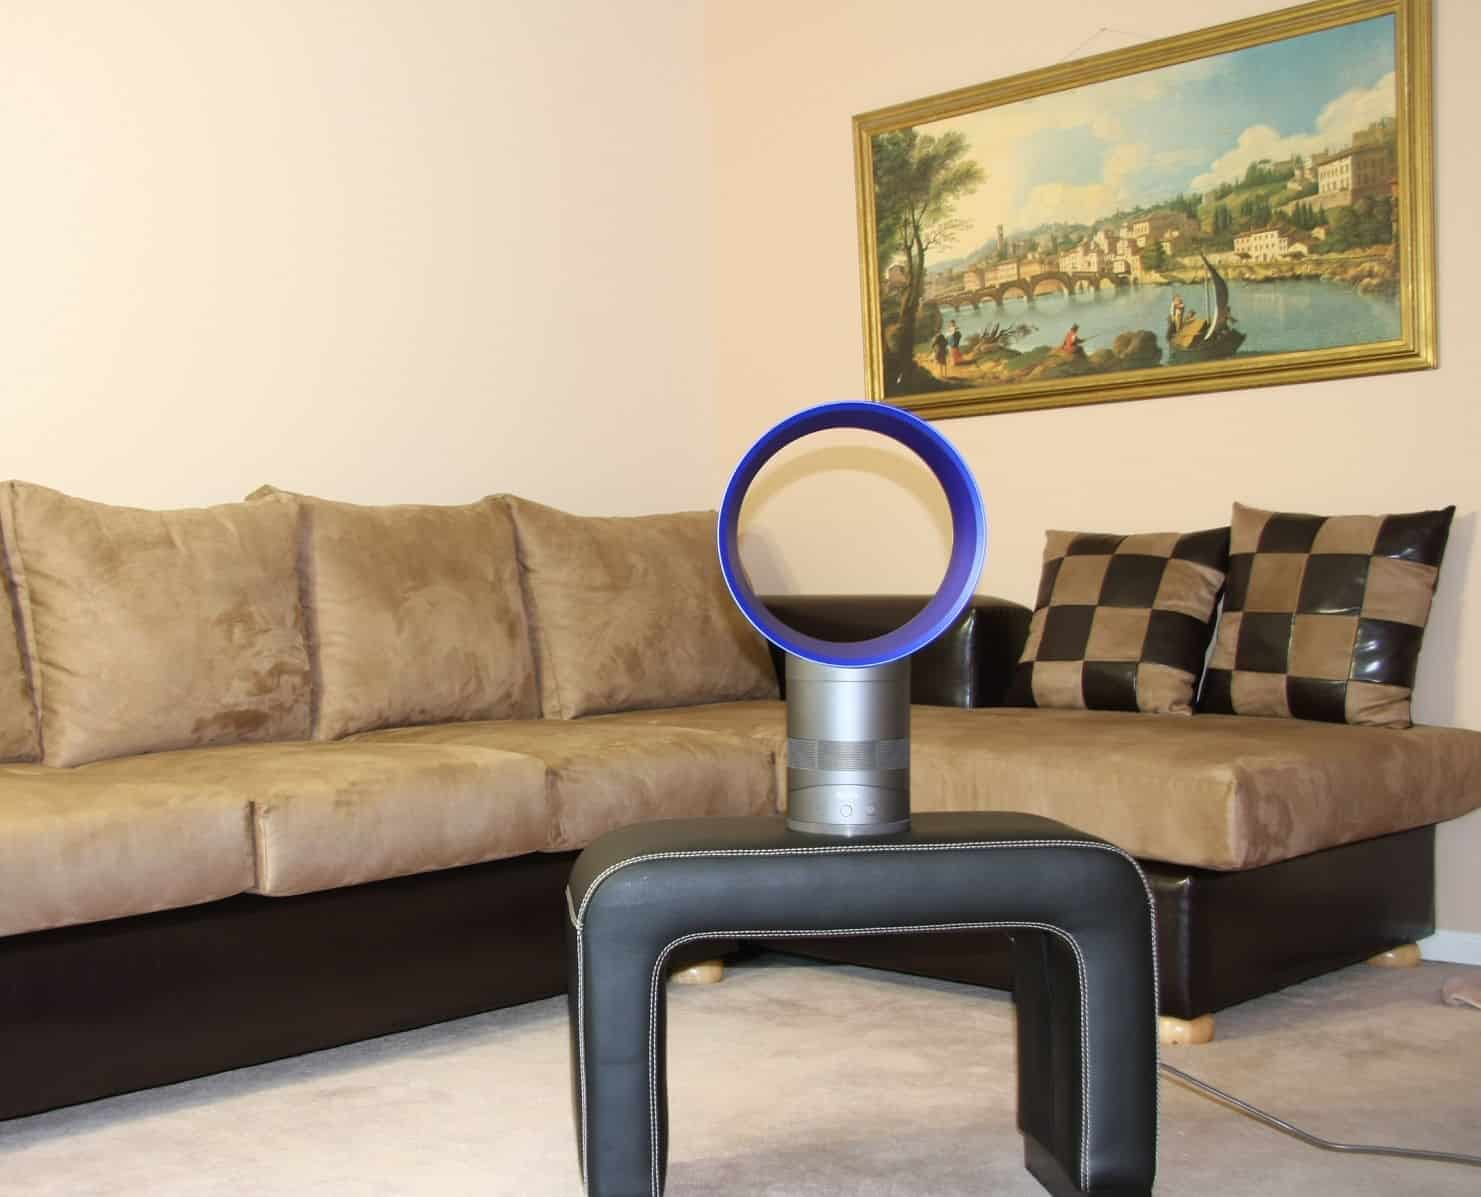 Dyson-Air-Multiplier-Fan-Review